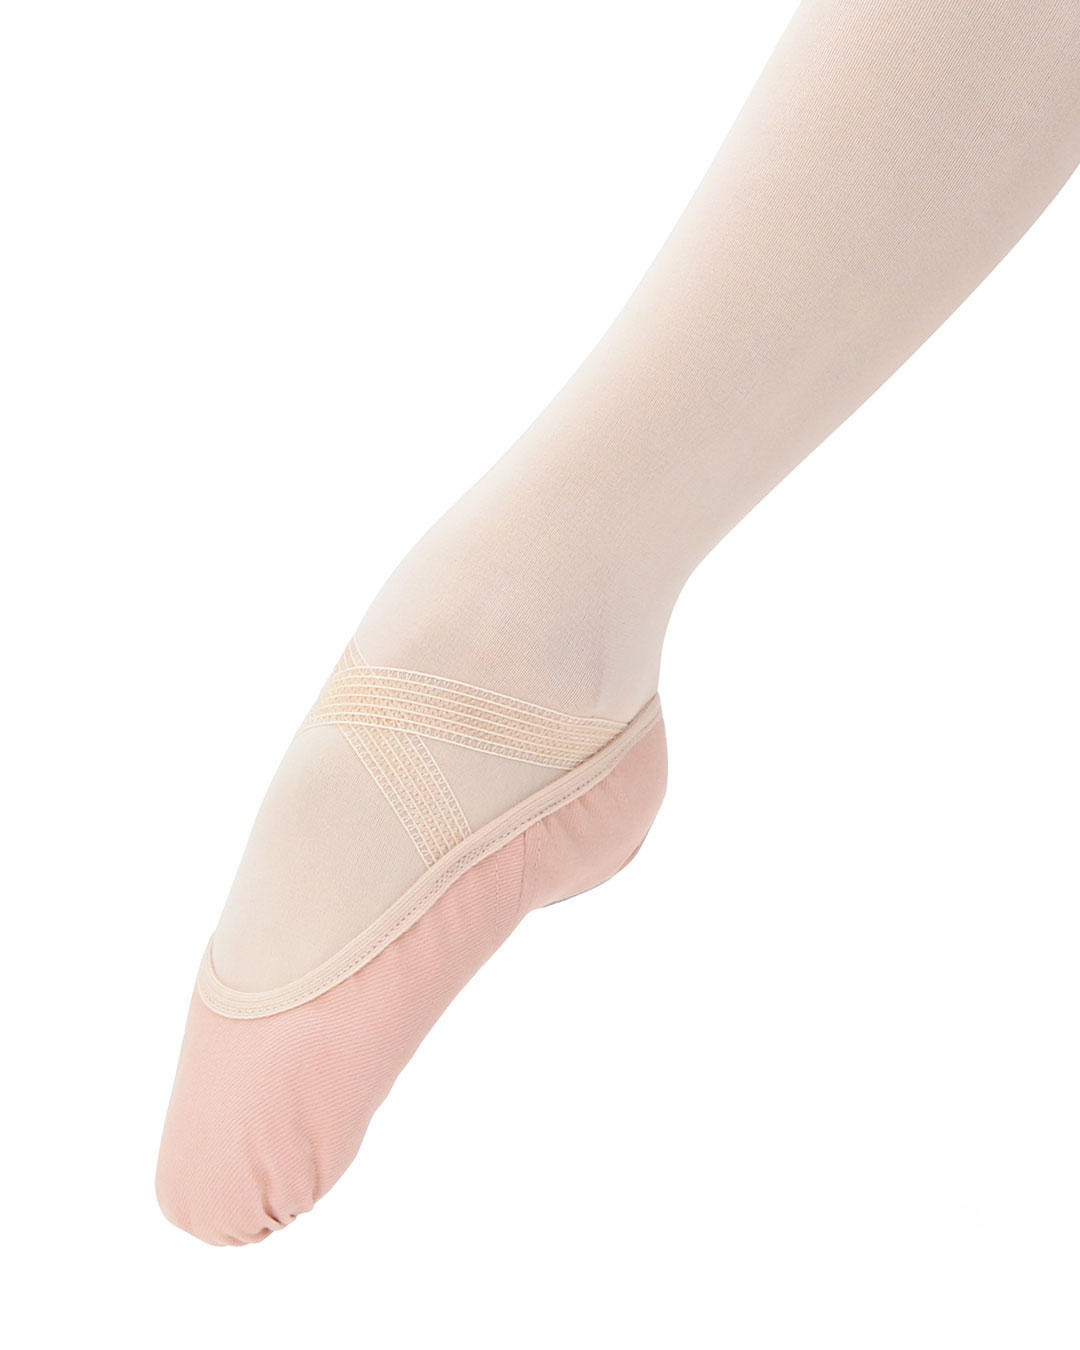 0209_ballet_shoes_1.jpg